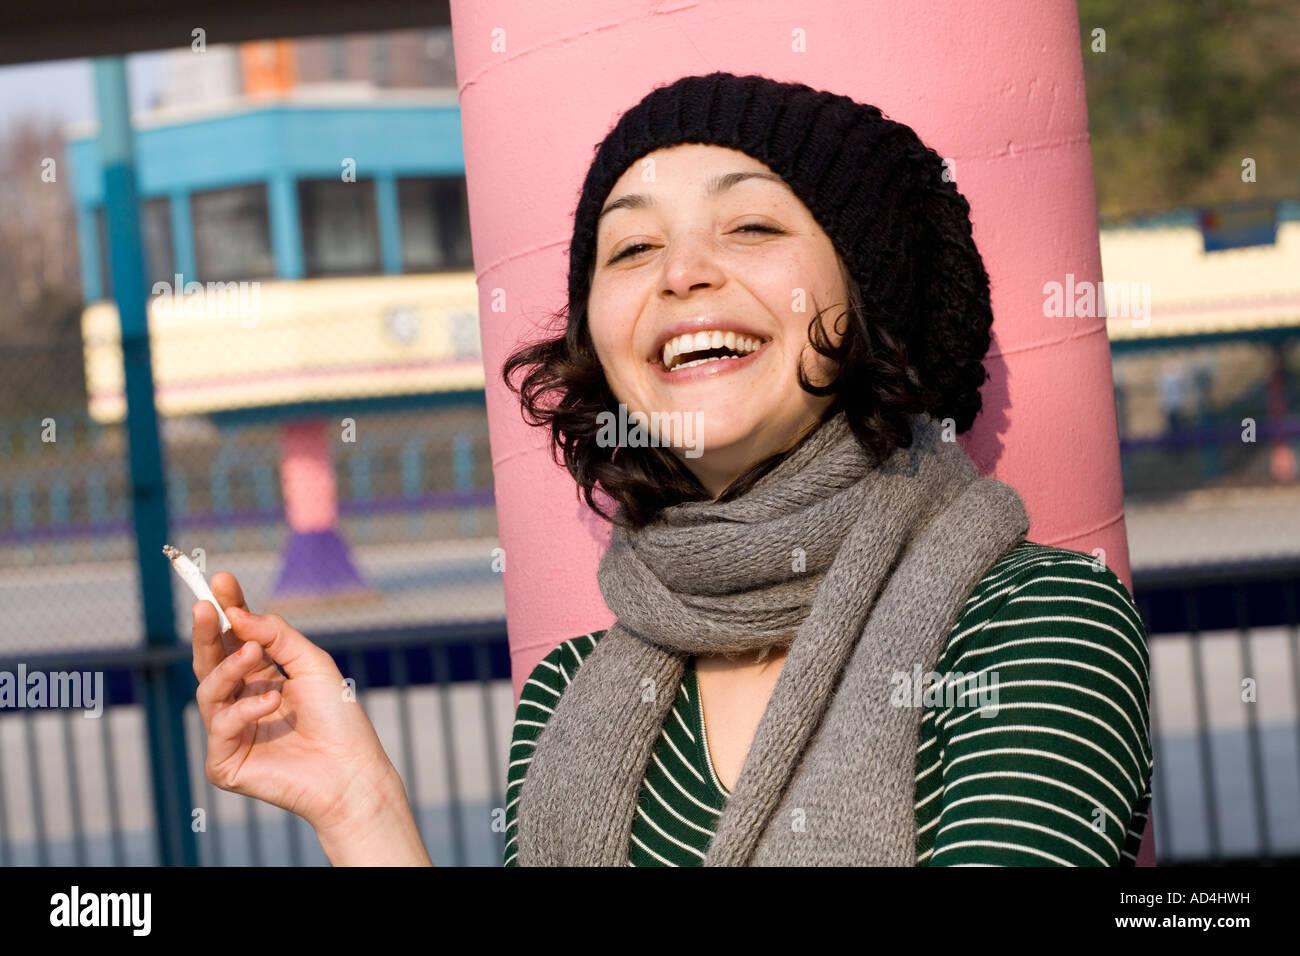 A woman smoking a cigarette - Stock Image